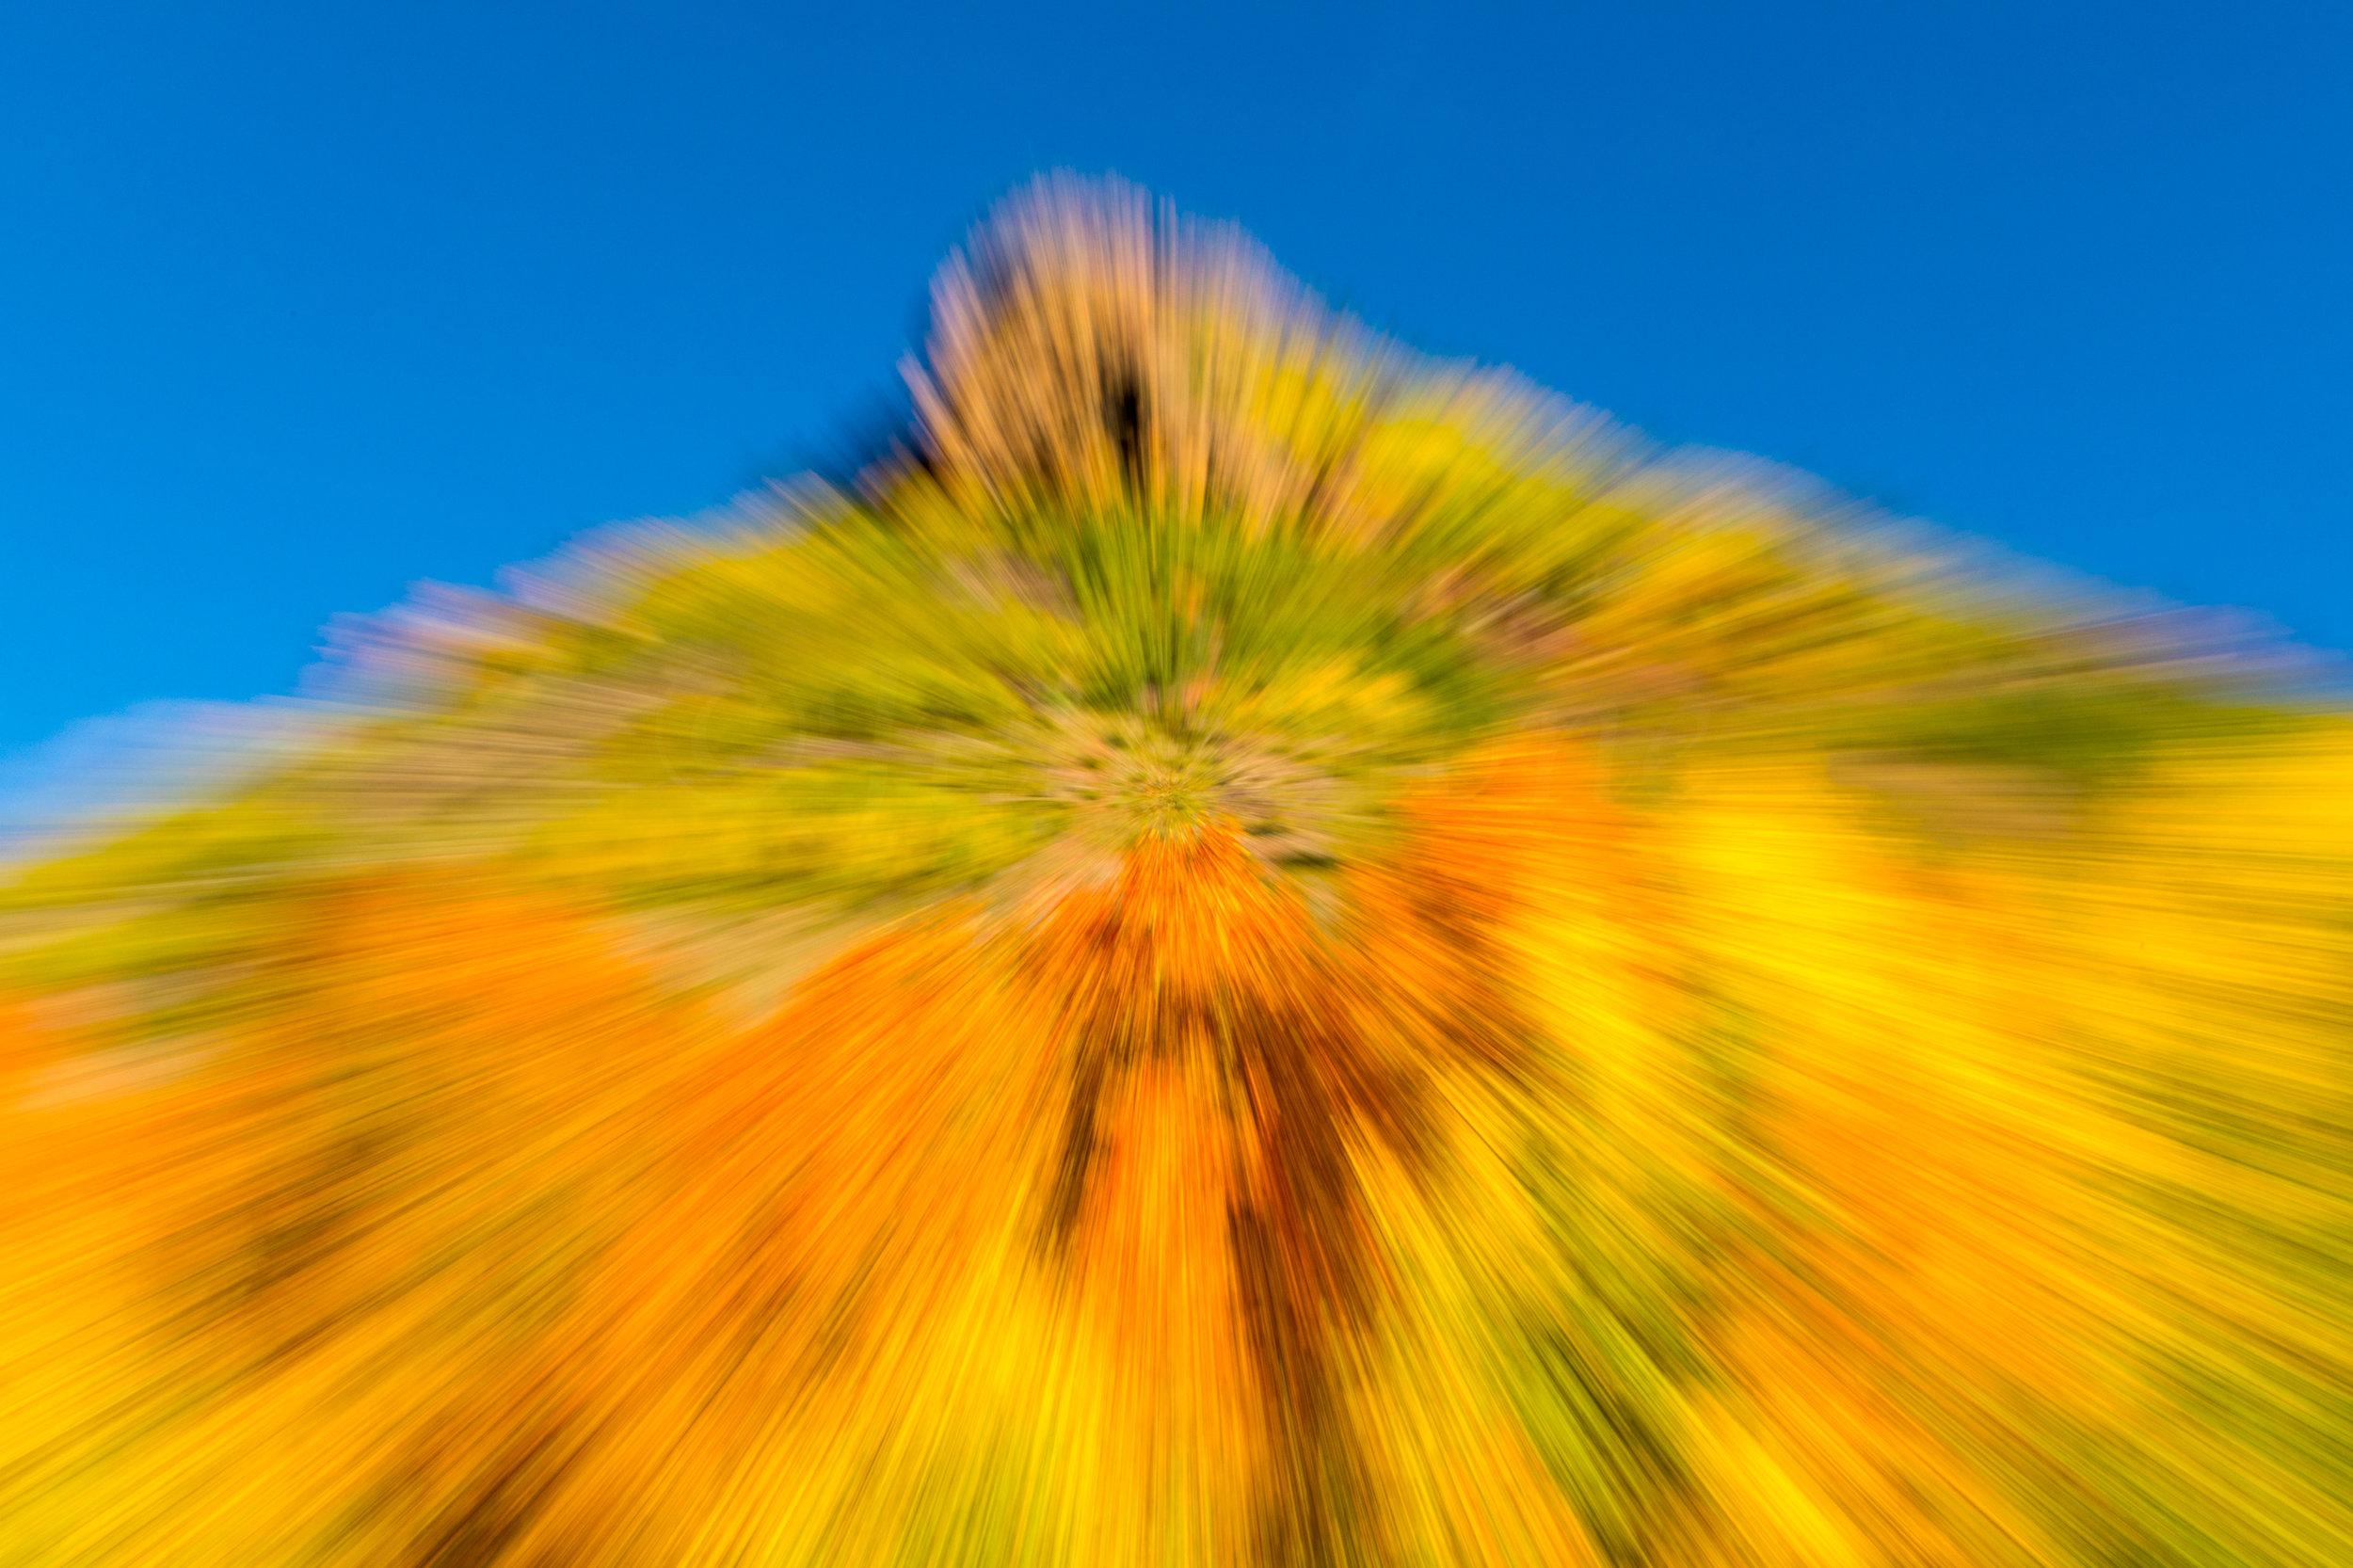 Silverton, Colorado, Anvil Mountain Kaleidoscope Image # 9186